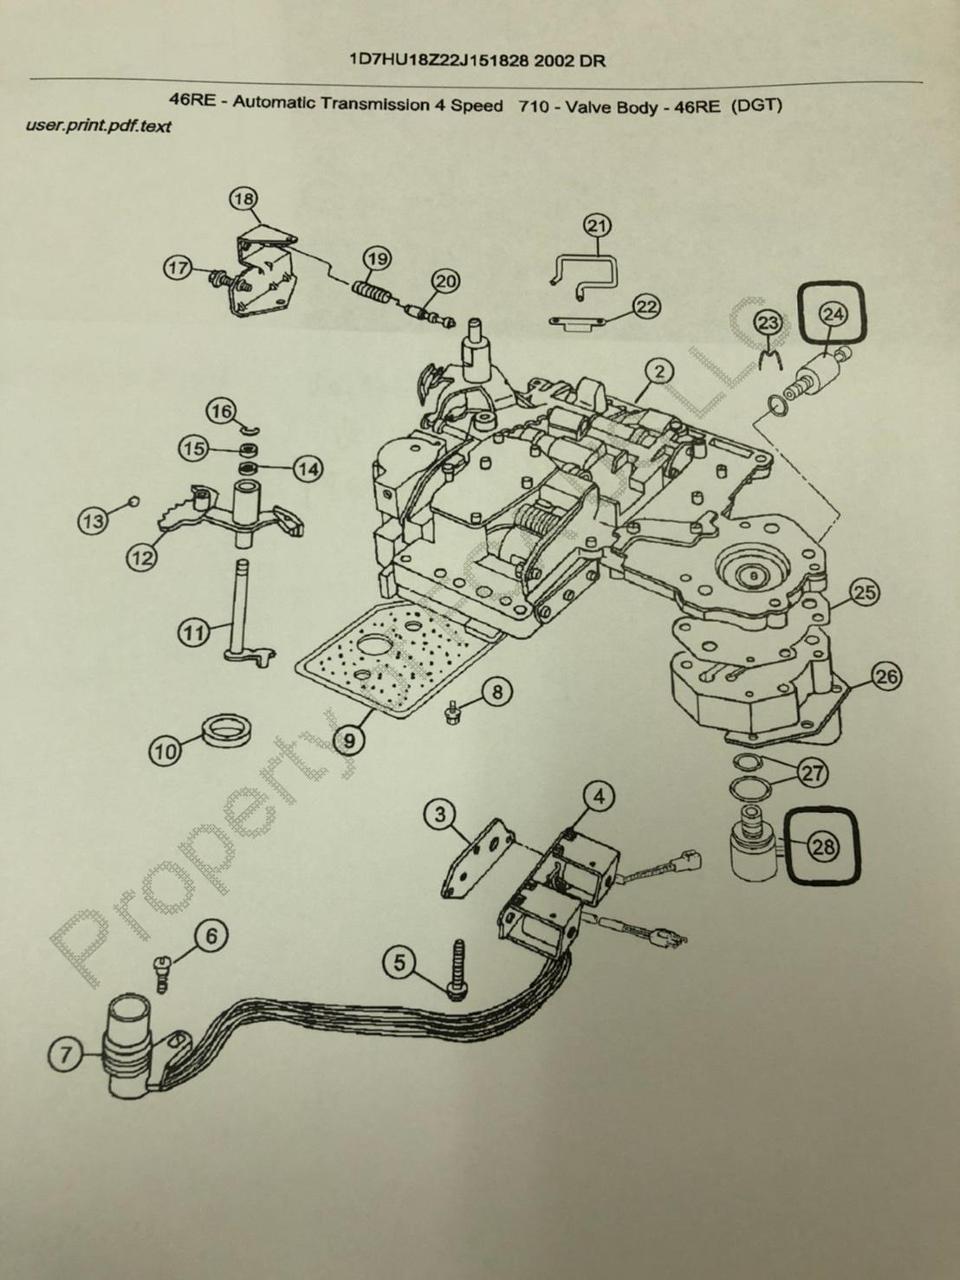 MOPAR ガバナープレッシャーセンサー